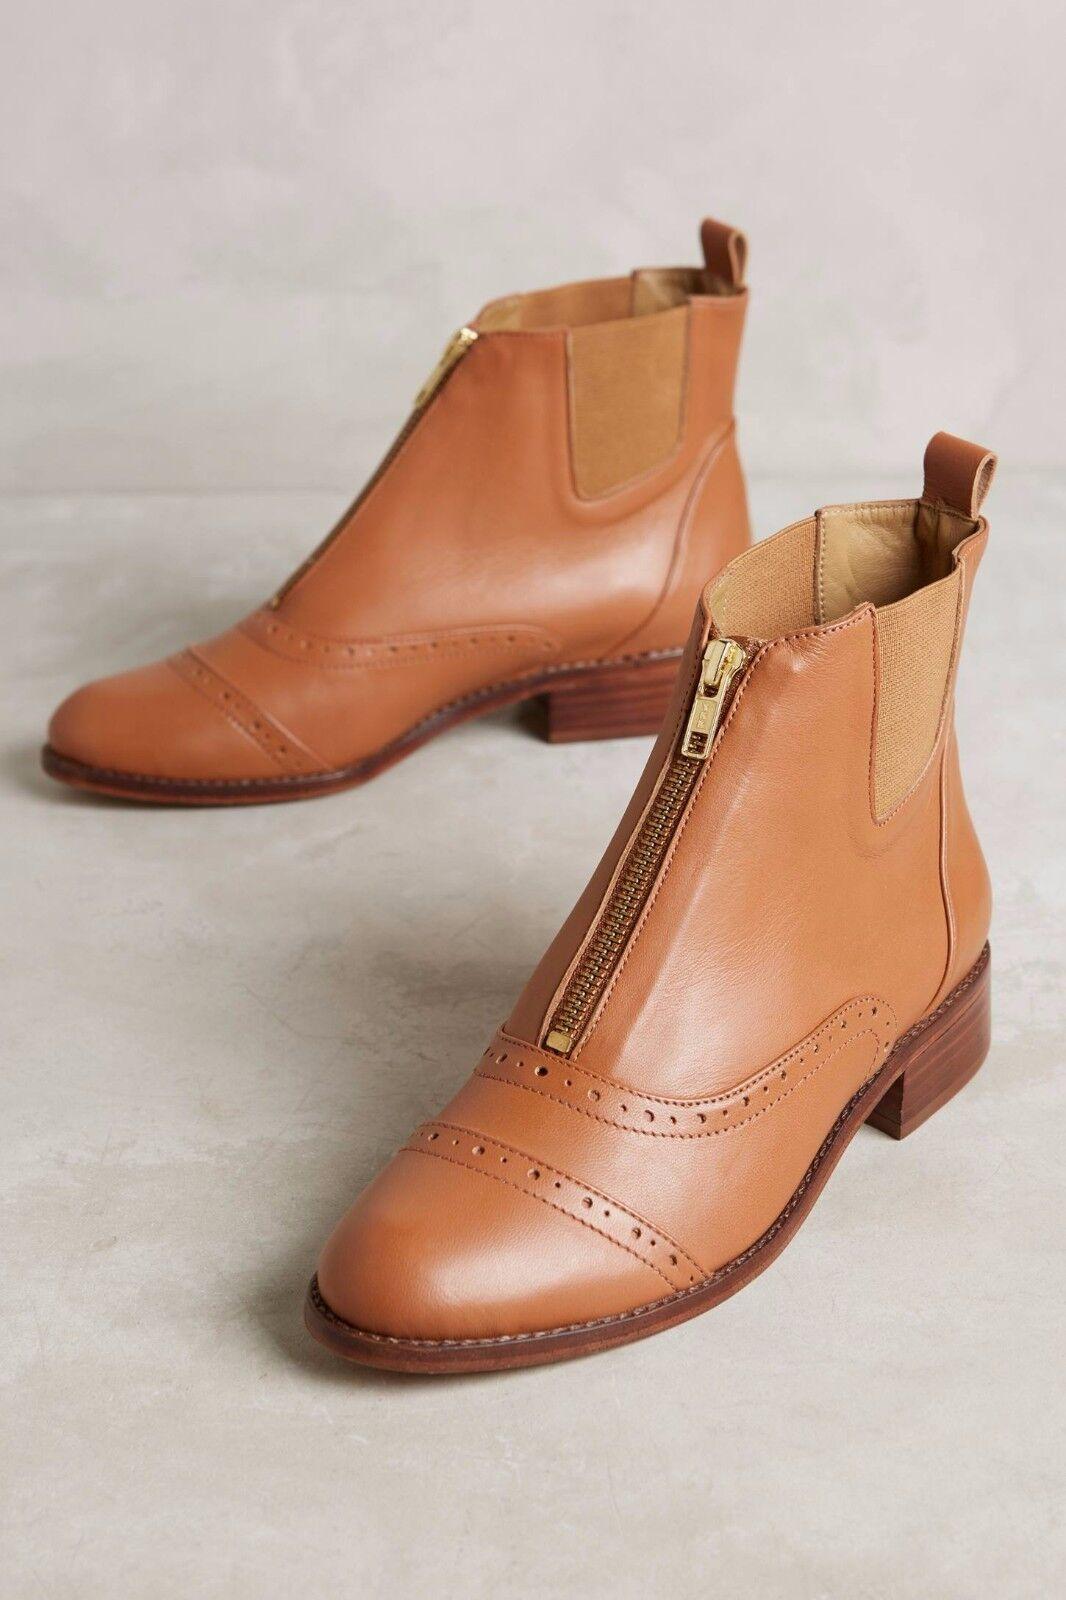 Anthropologie Nina Payne Charli Chelsea Boots  347 Sz Sz Sz 39, 9 - NWOB eabfb5